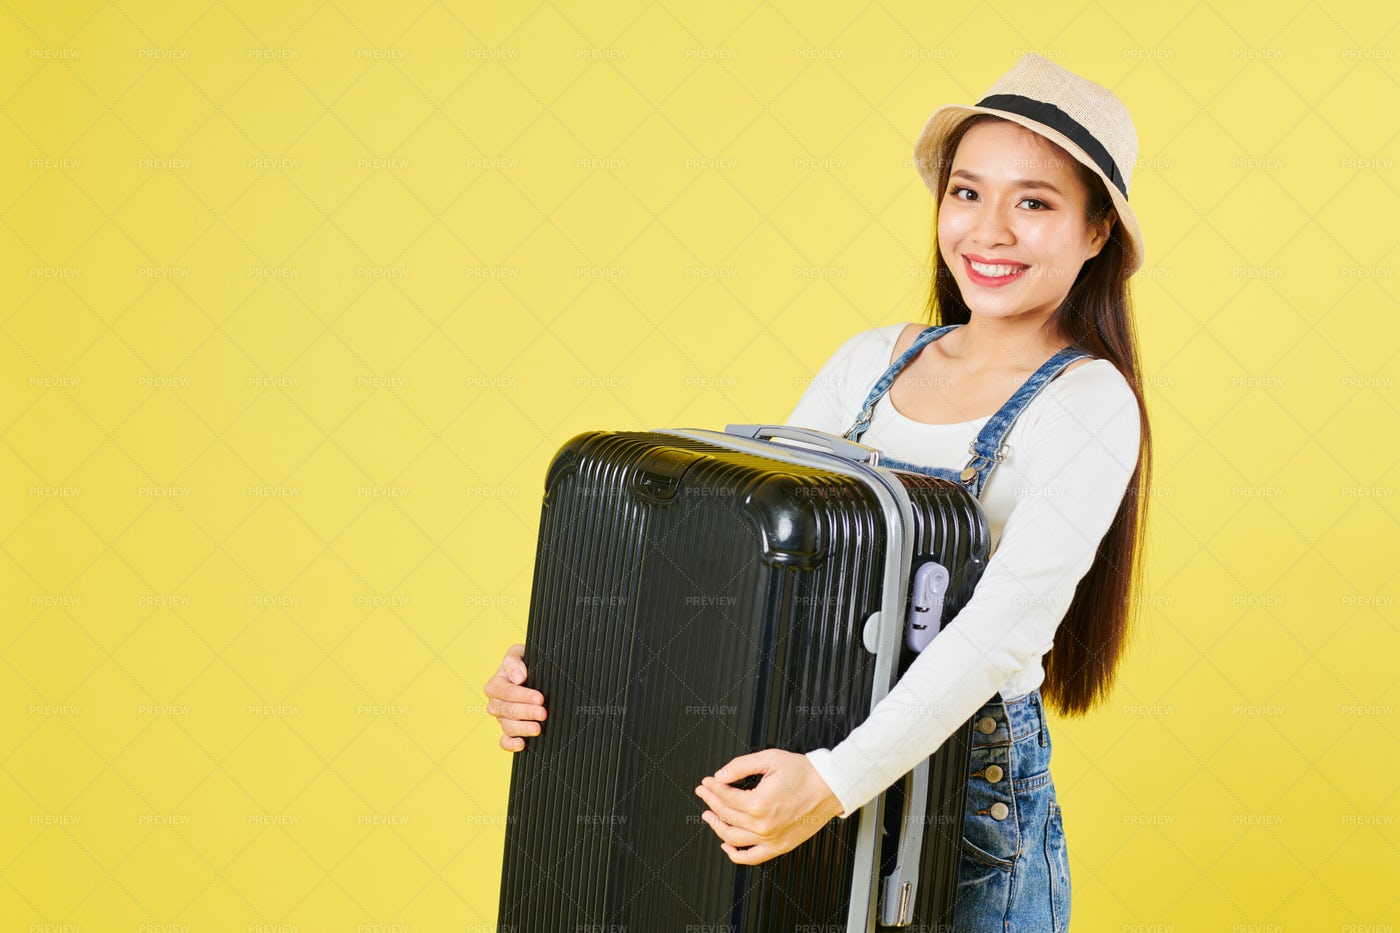 Female Tourist Lifting Heavy Suitcase: Stock Photos